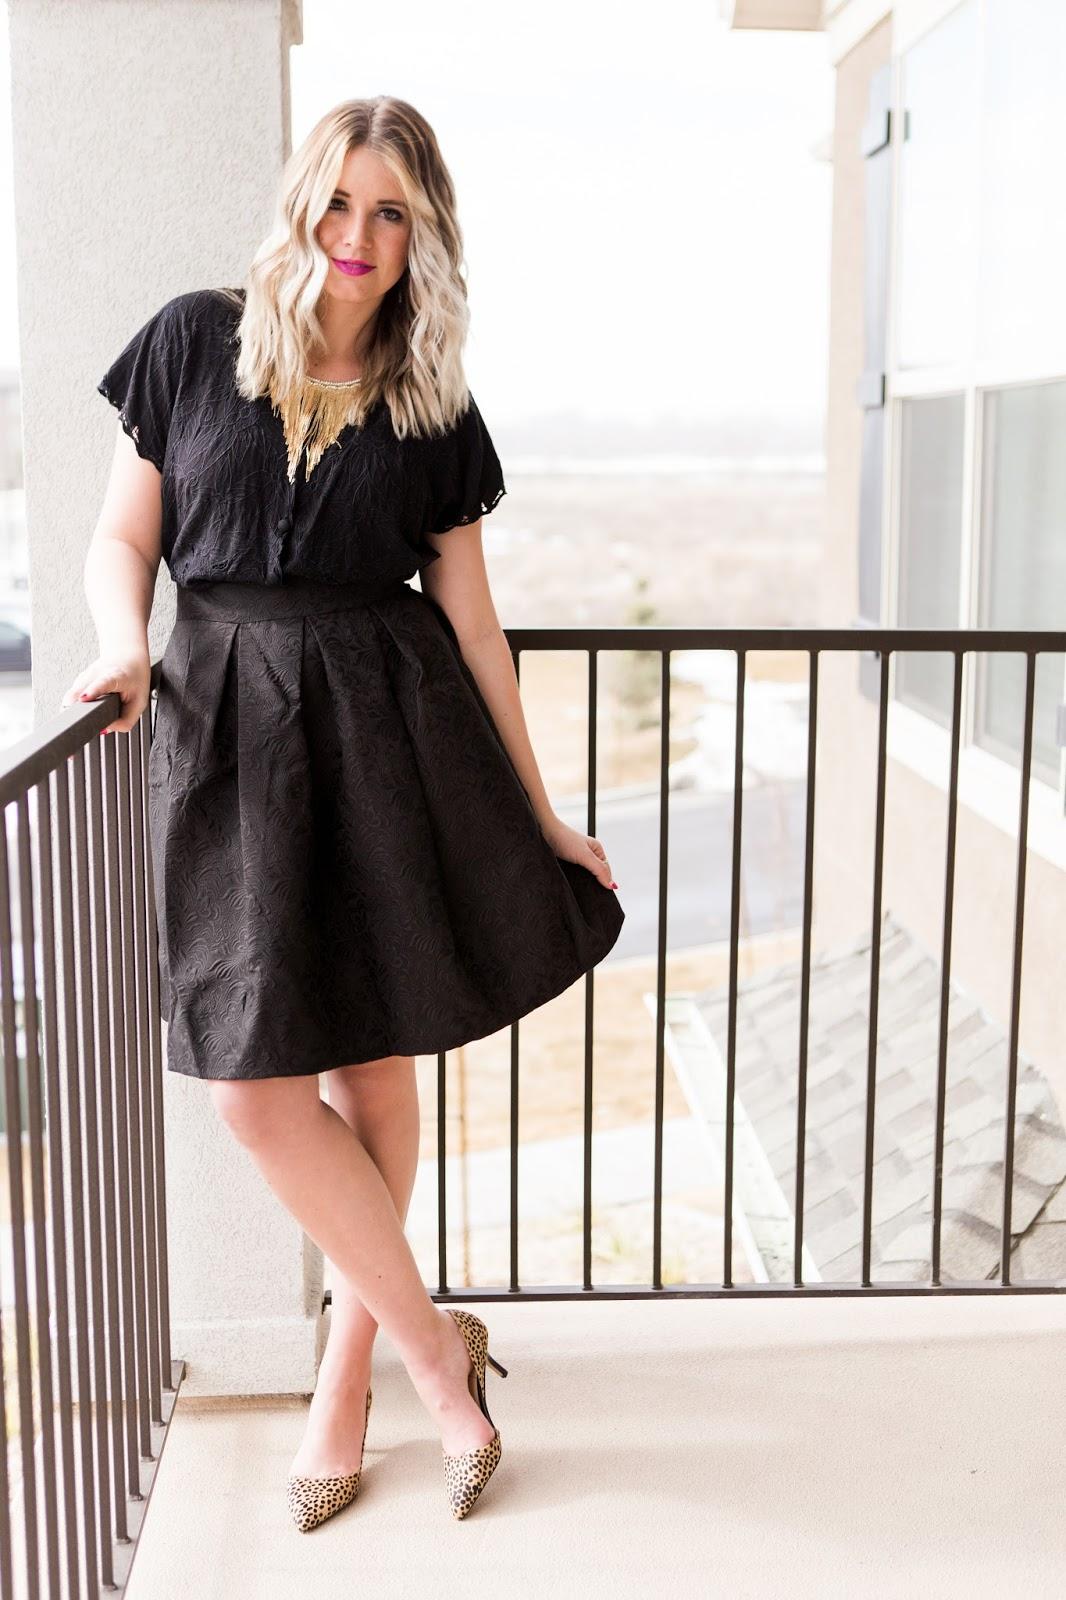 Tara Lynn's, Skirt, All Black, Fashionest Necklace